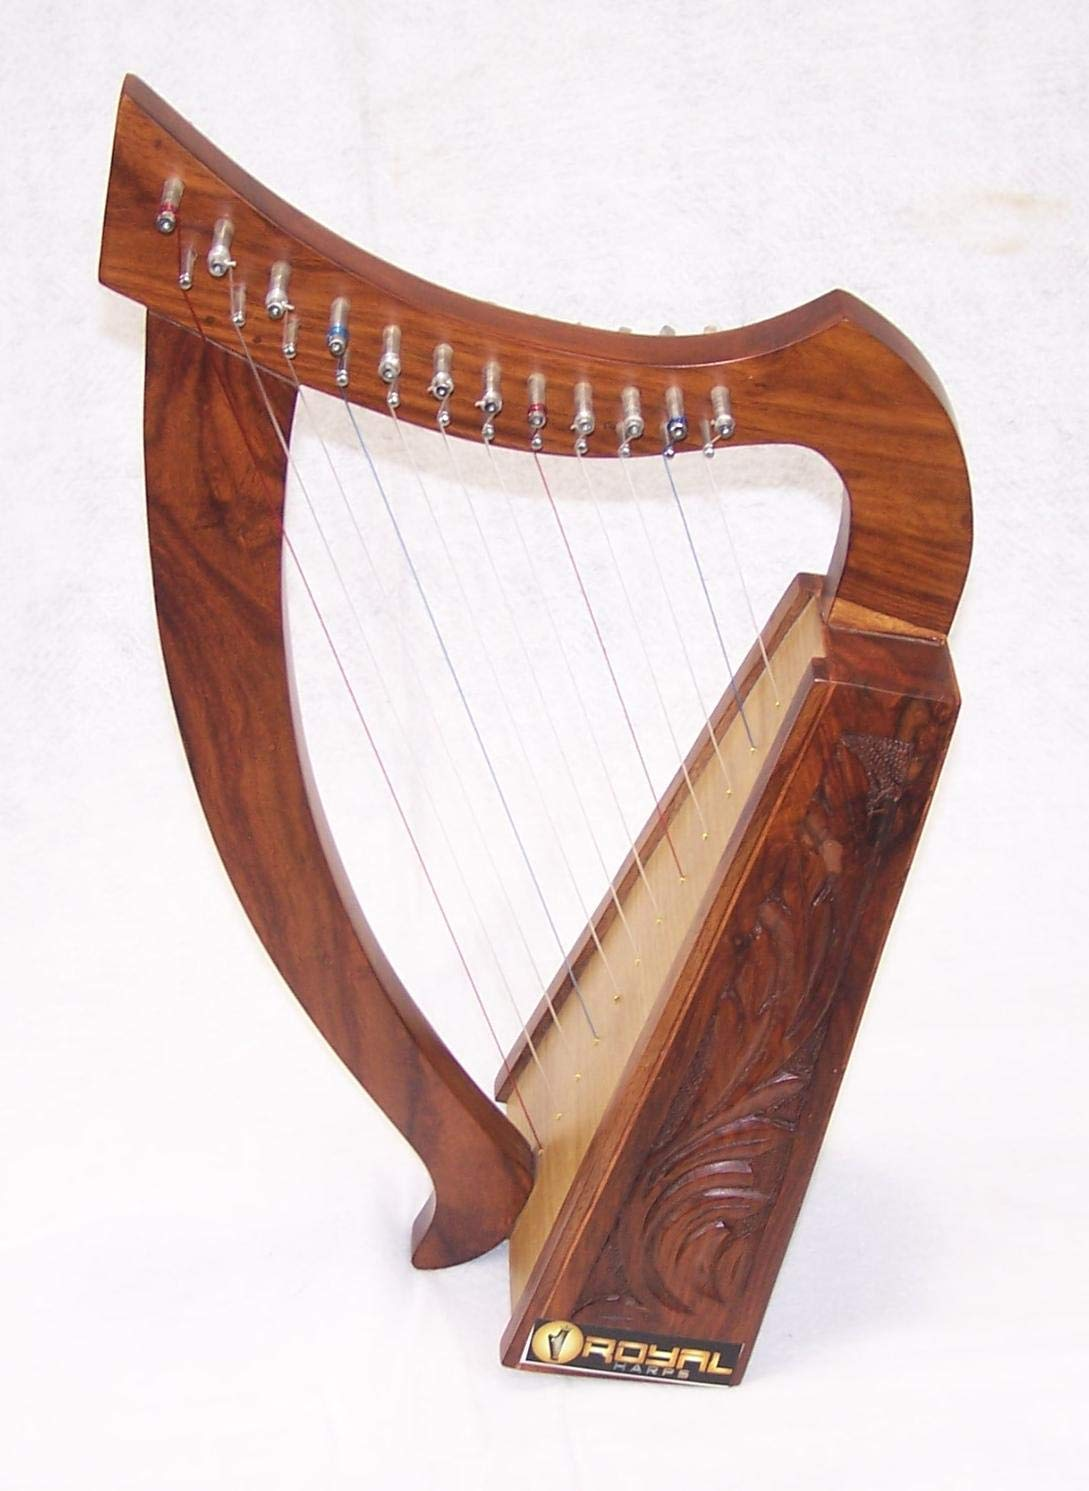 Celtic Irish Baby Harp 12 Strings Solid Wood Free Bag Strings Key by ROYAL HARPS (Image #7)